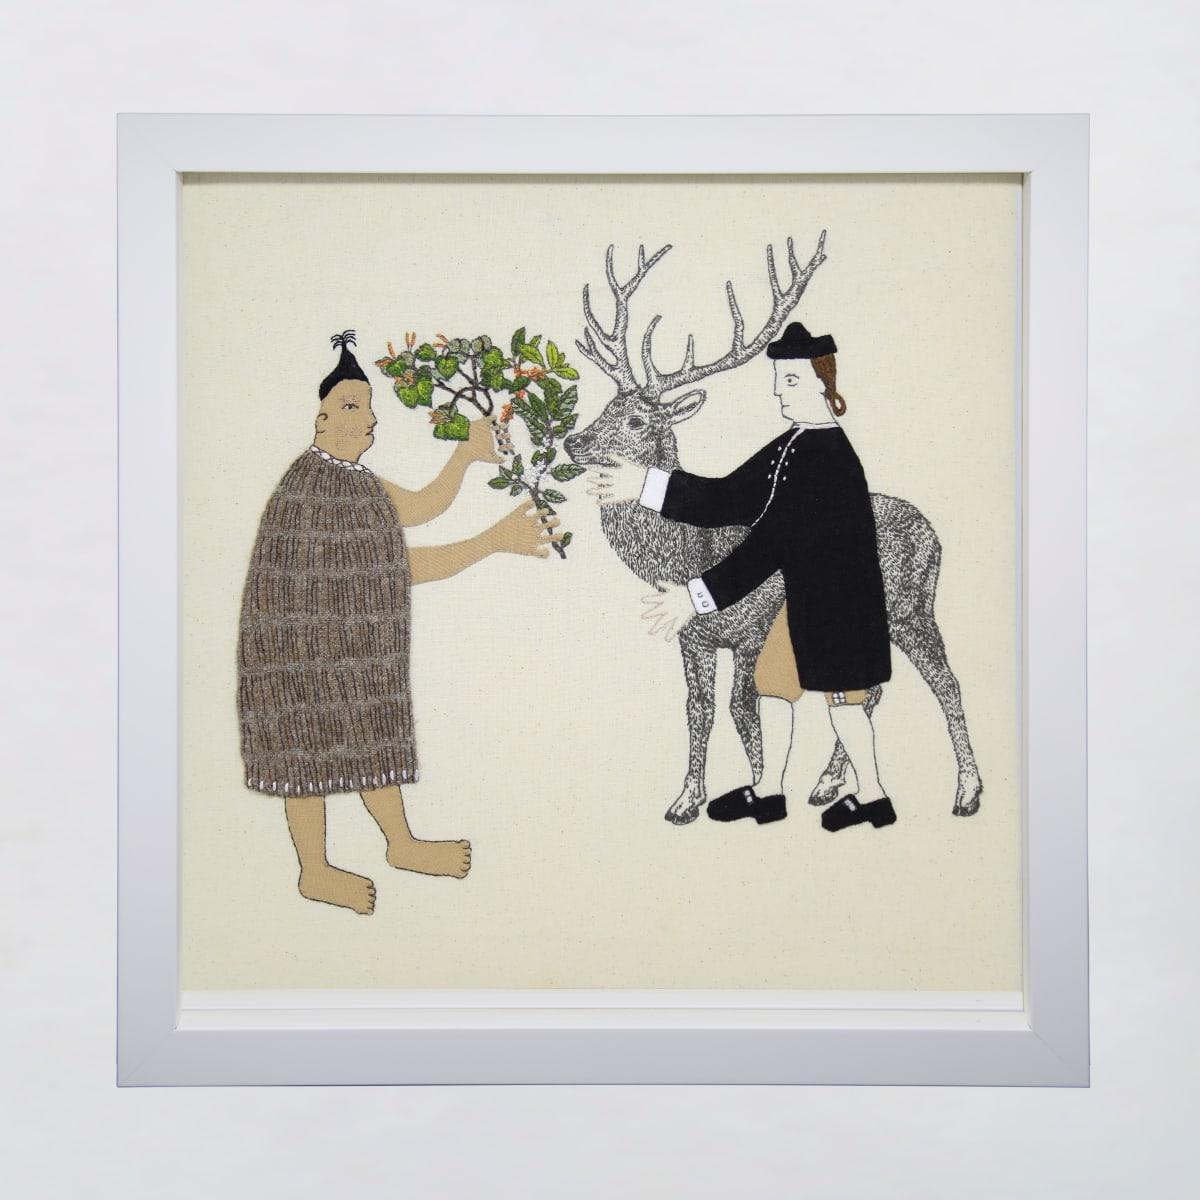 Sarah Munro, Trade Items - Understorey, Deer, 2019